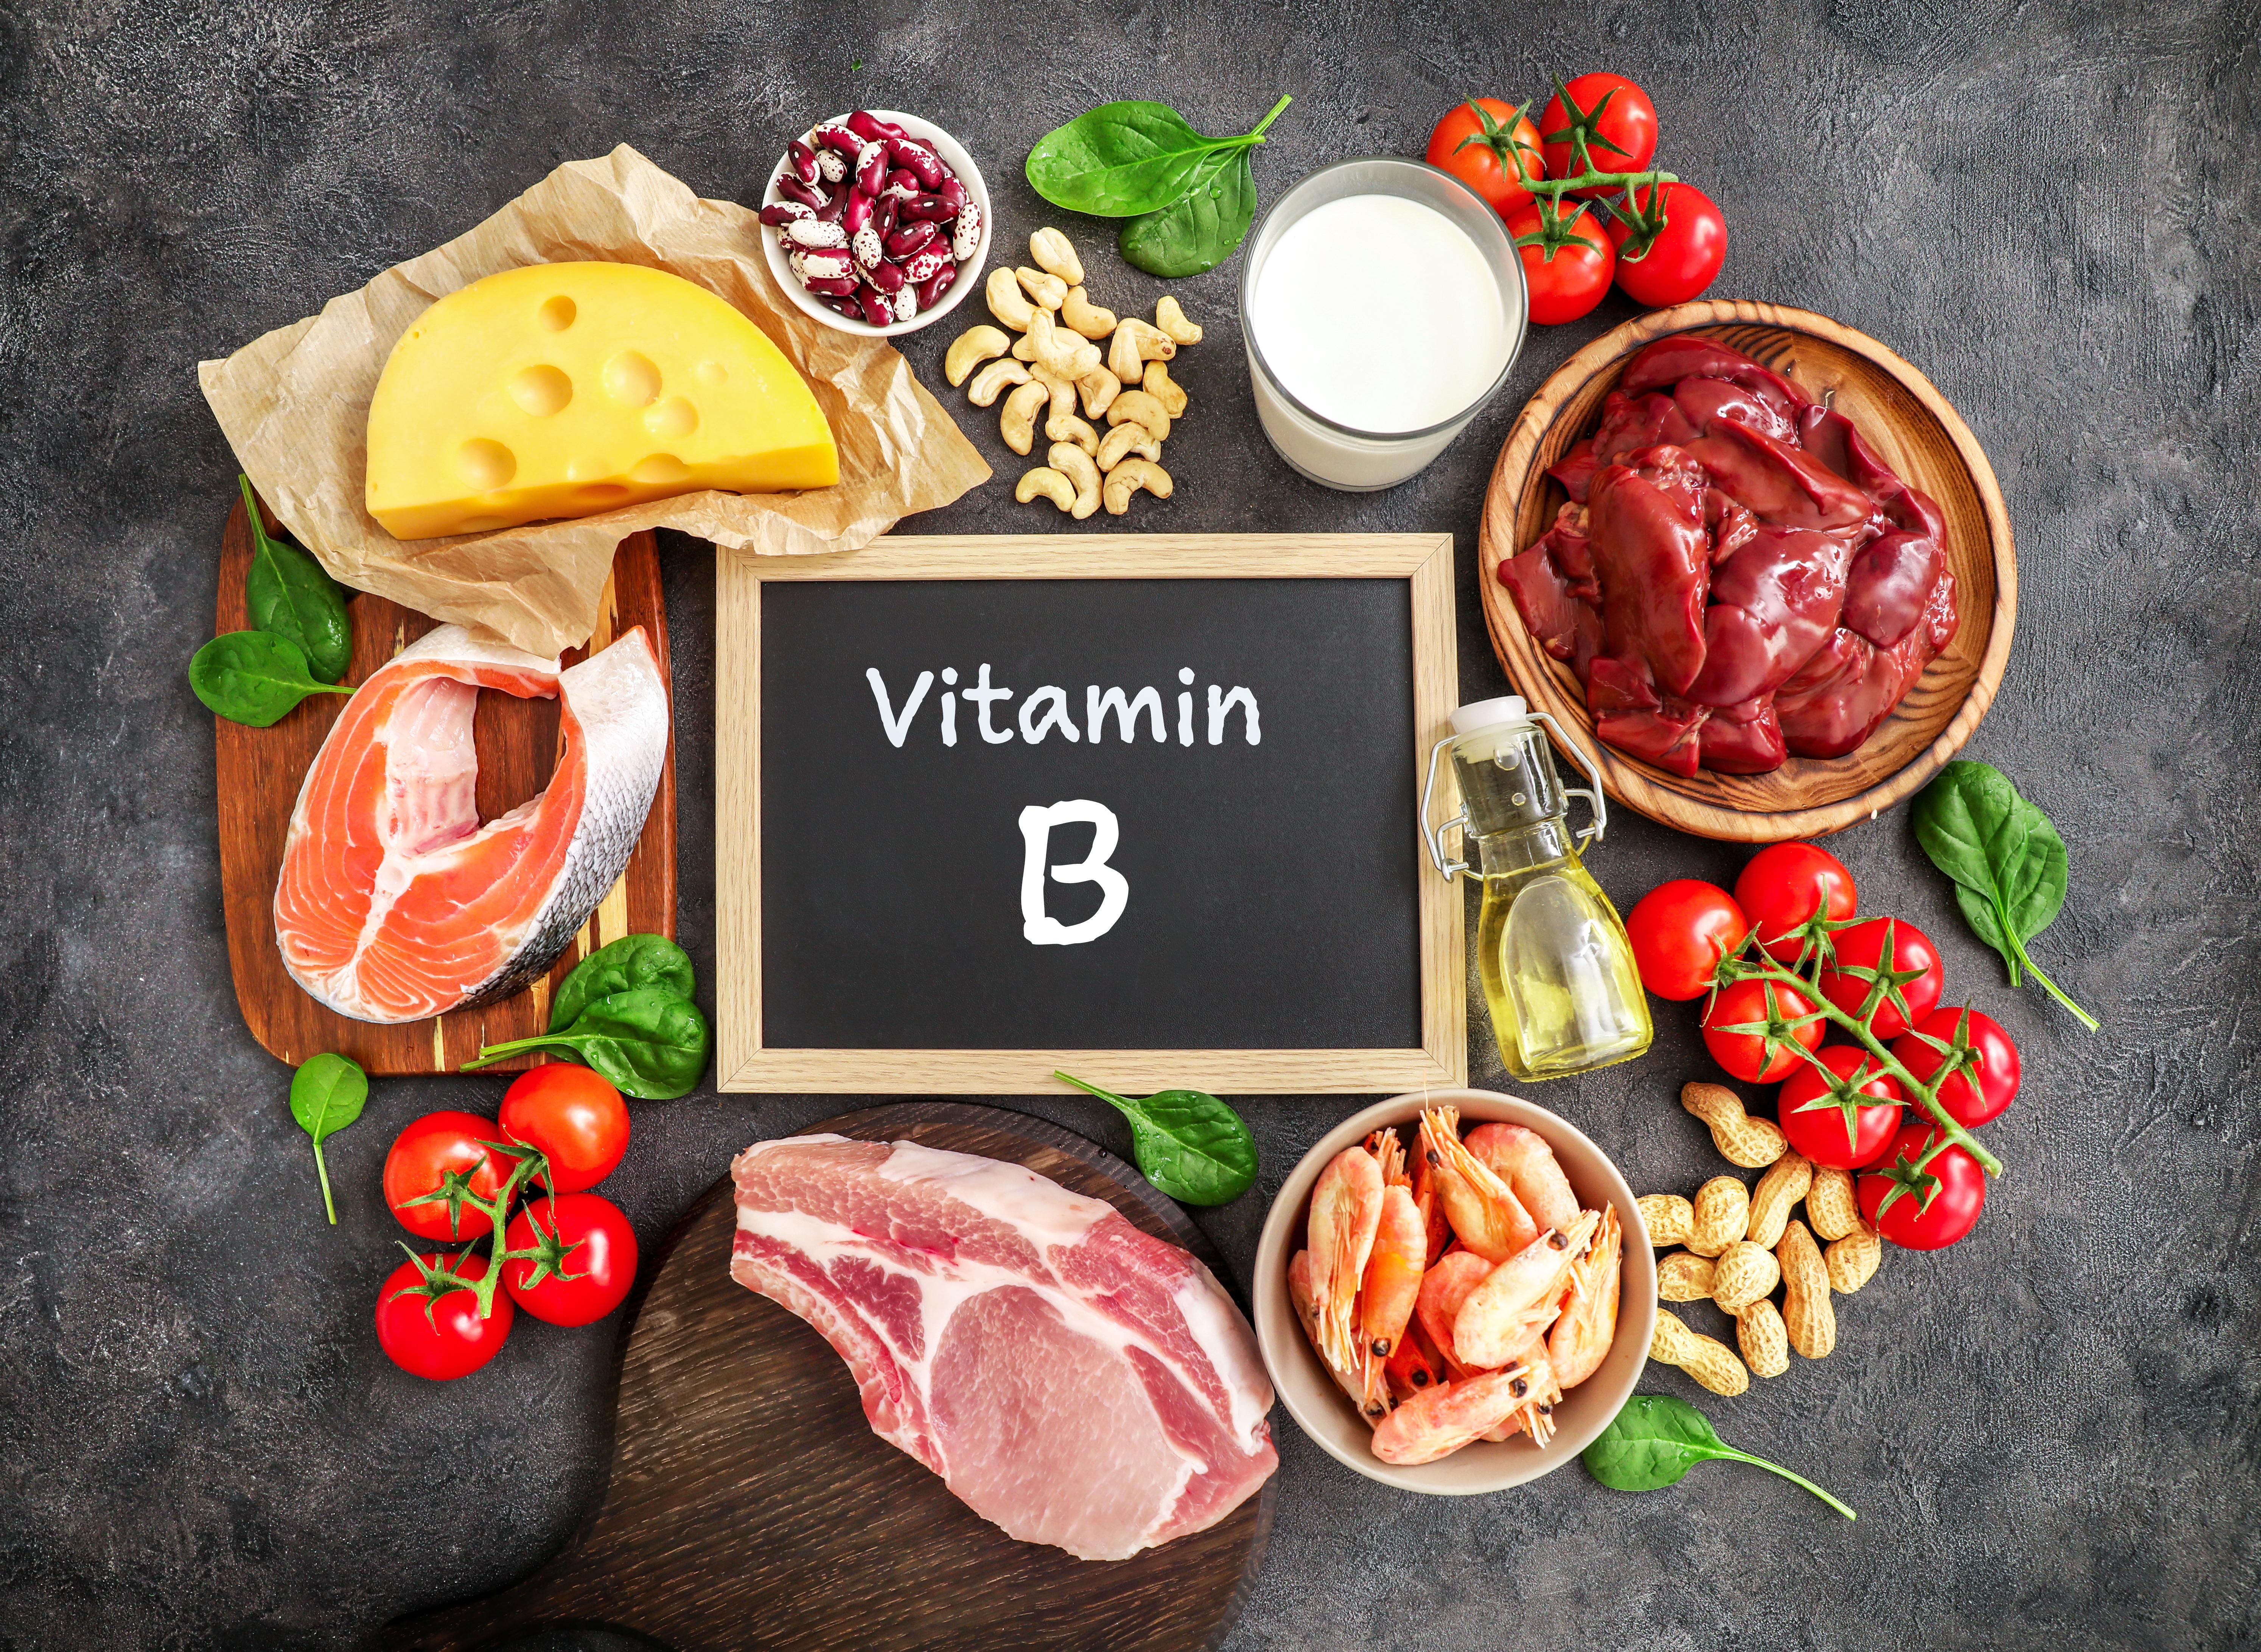 B Vitamins Are Essential For Brain Health